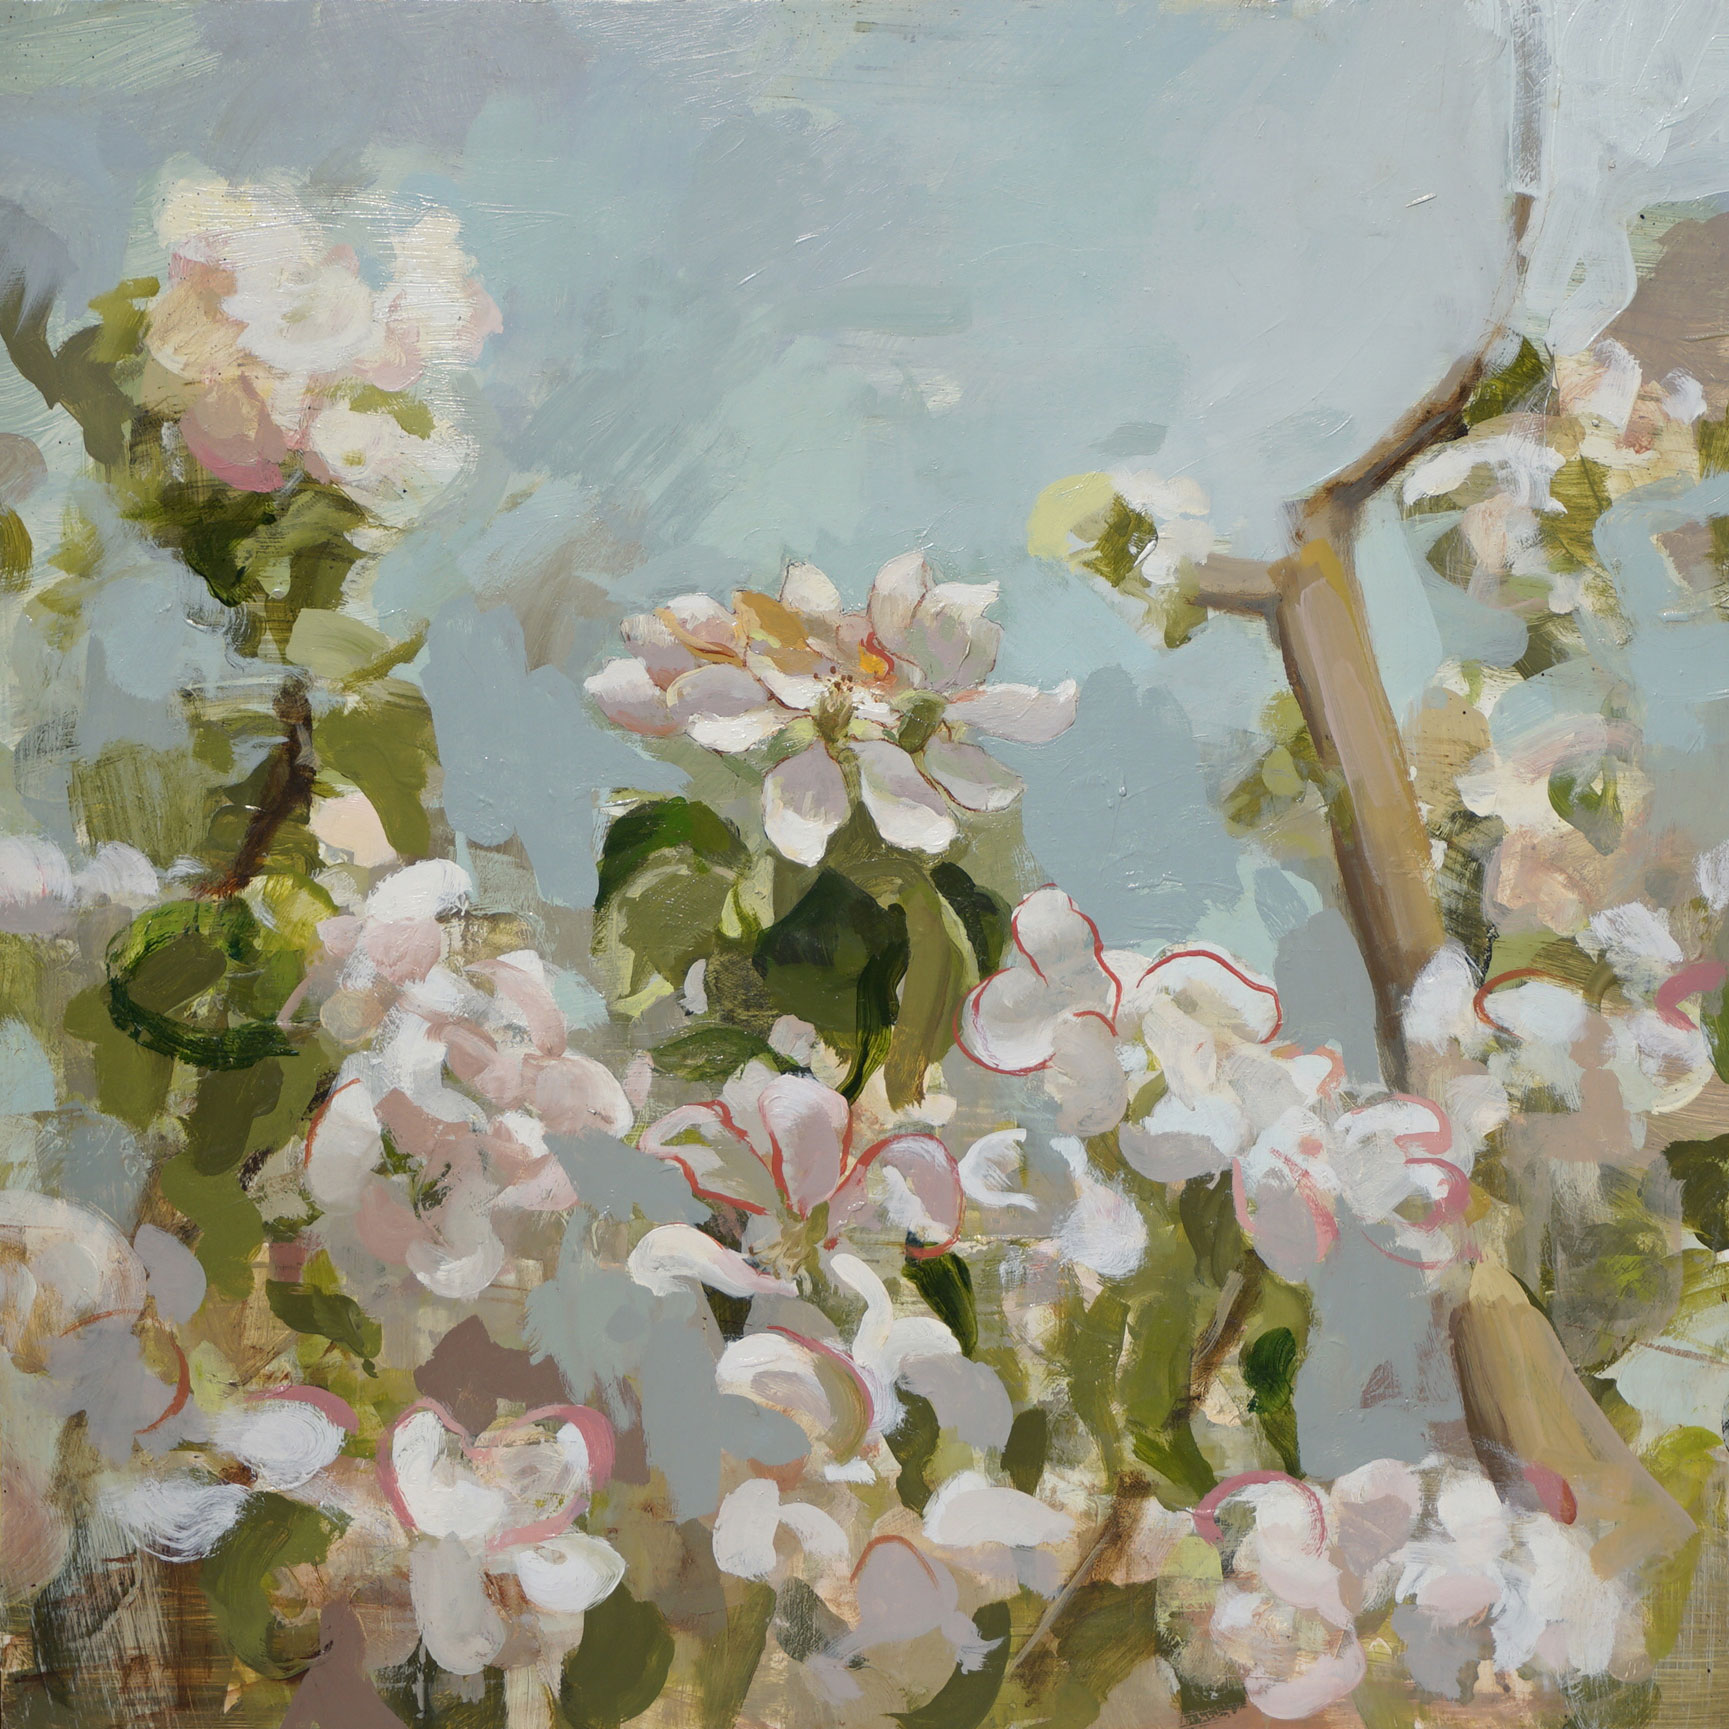 mark-crenshaw-1519-apple-blossom-2-(cezane).jpg